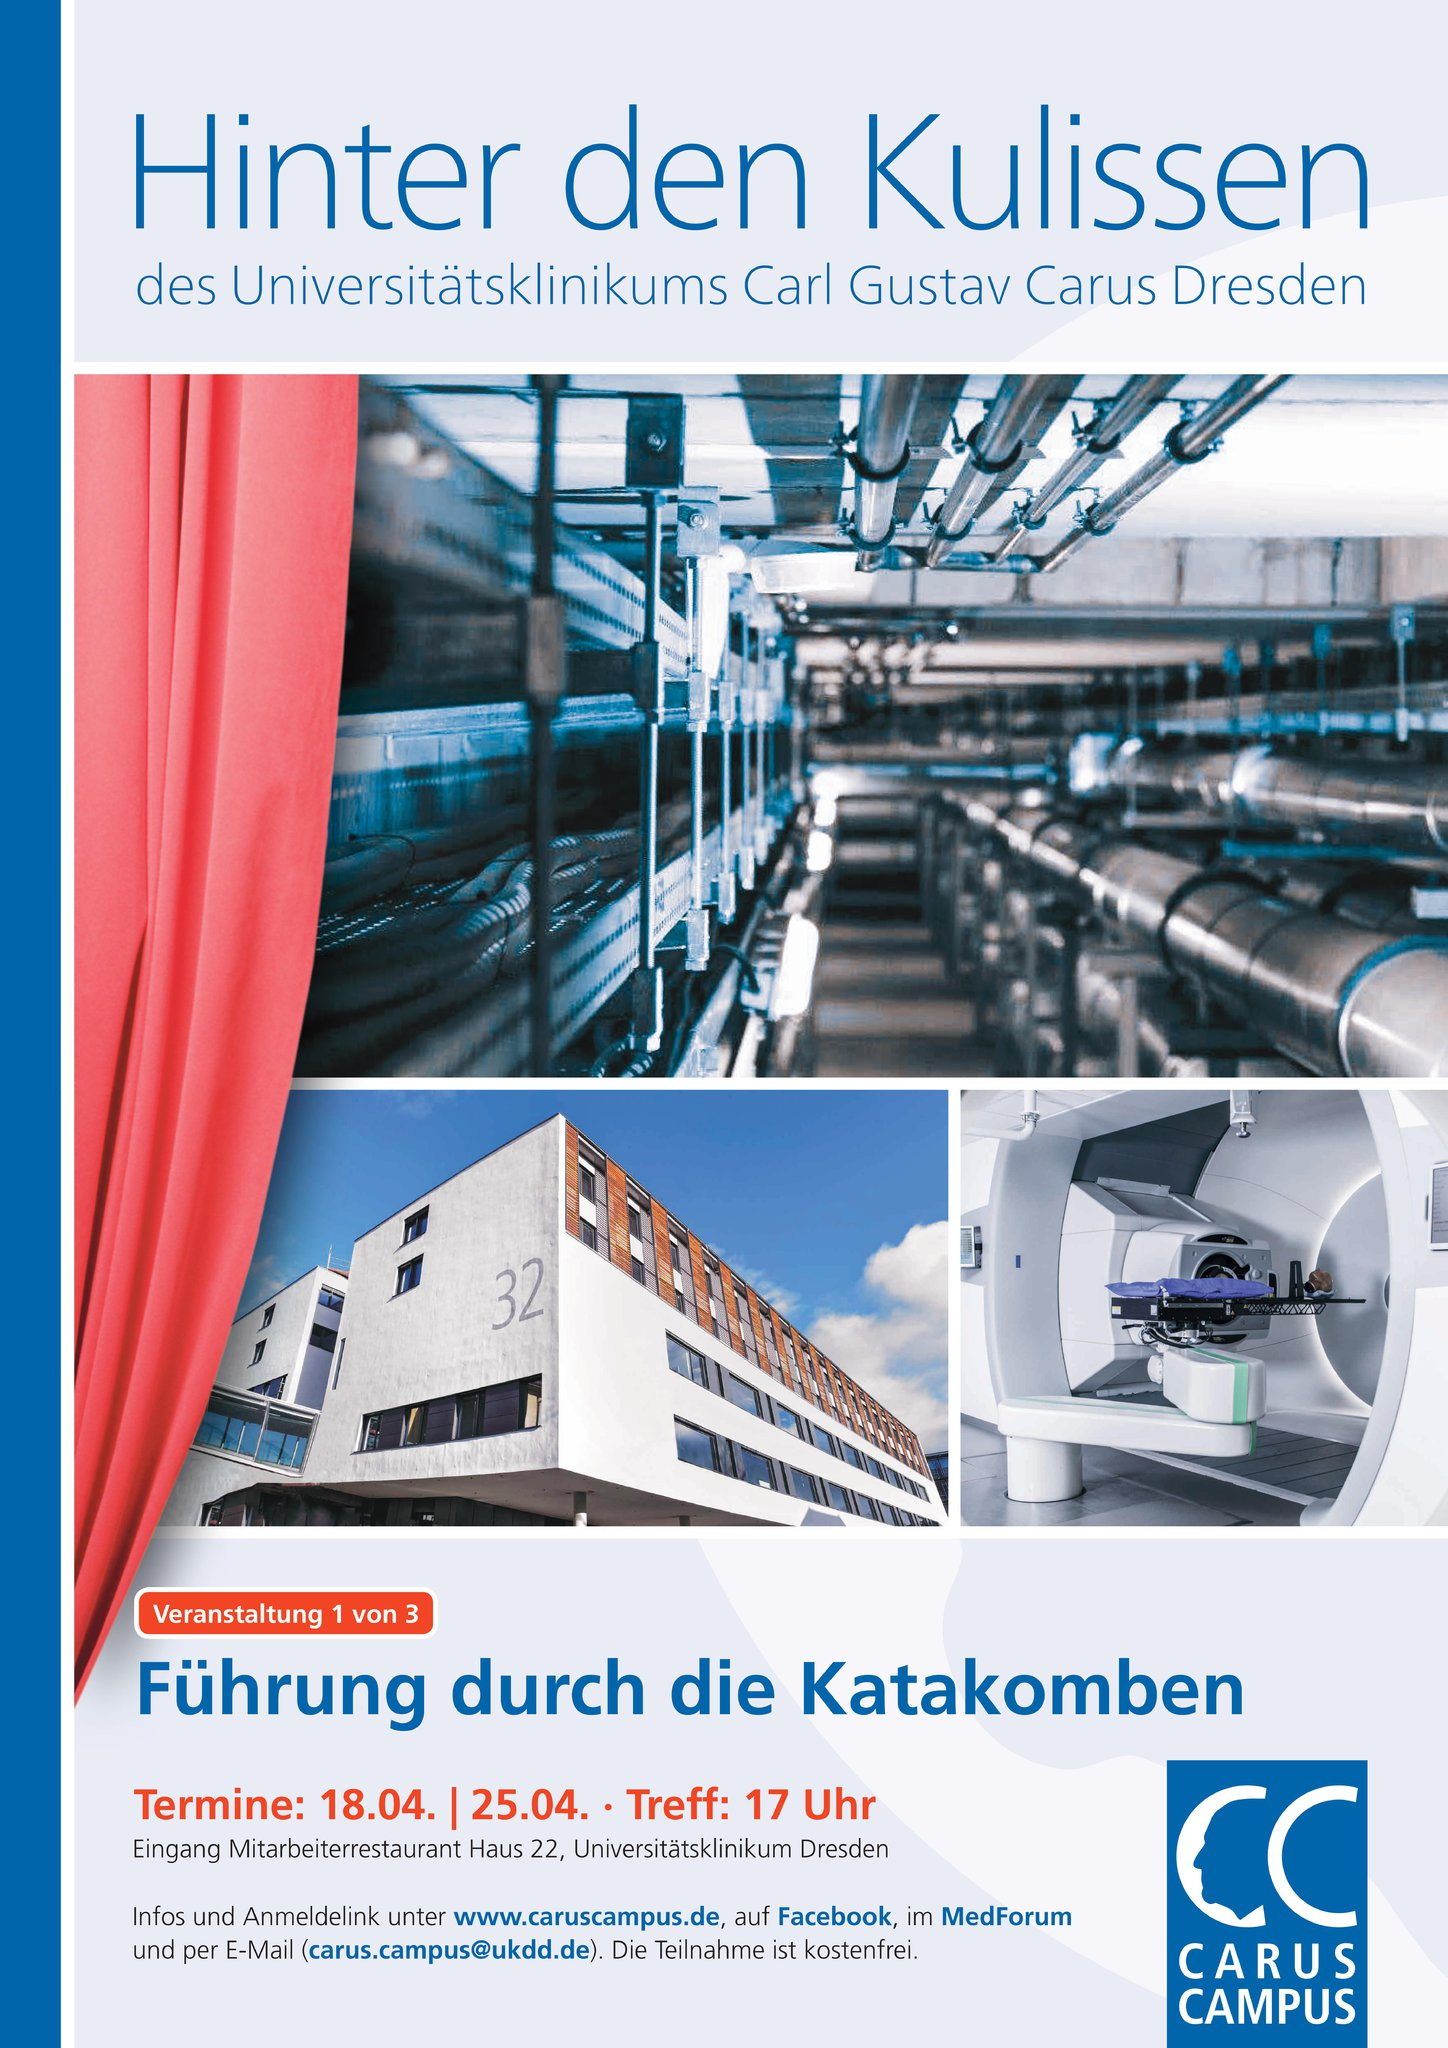 Hinter Den Kulissen Carus Campus Medforum Dresden Medizinische